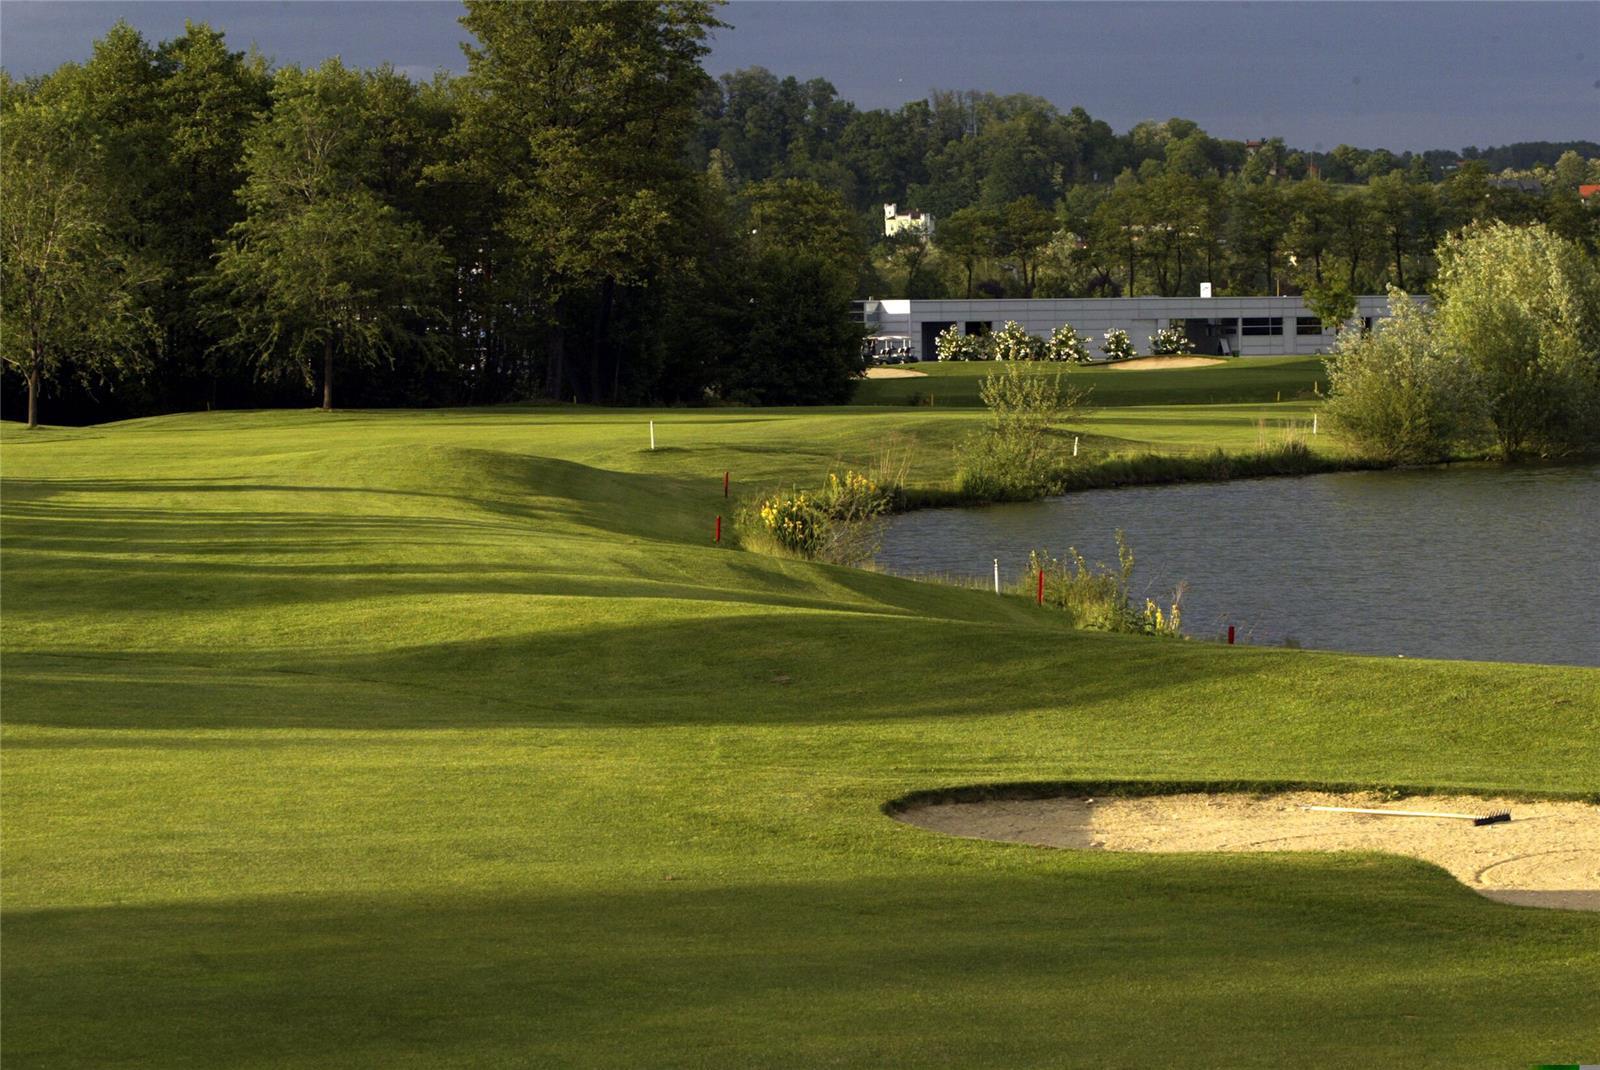 Ptuj Golf Club - Golf igrišče Ptuj